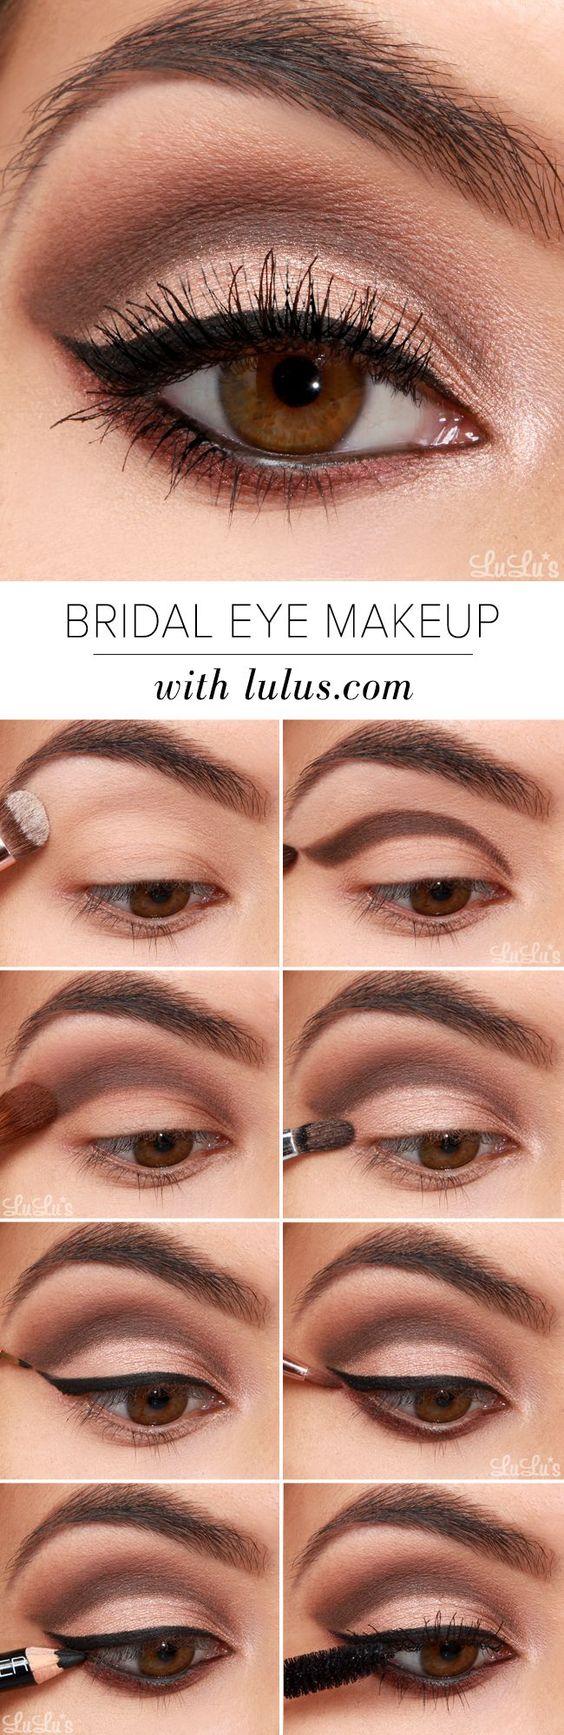 12 Easy Step by Step Bridal Eye Makeup Tutorials - Pretty Designs